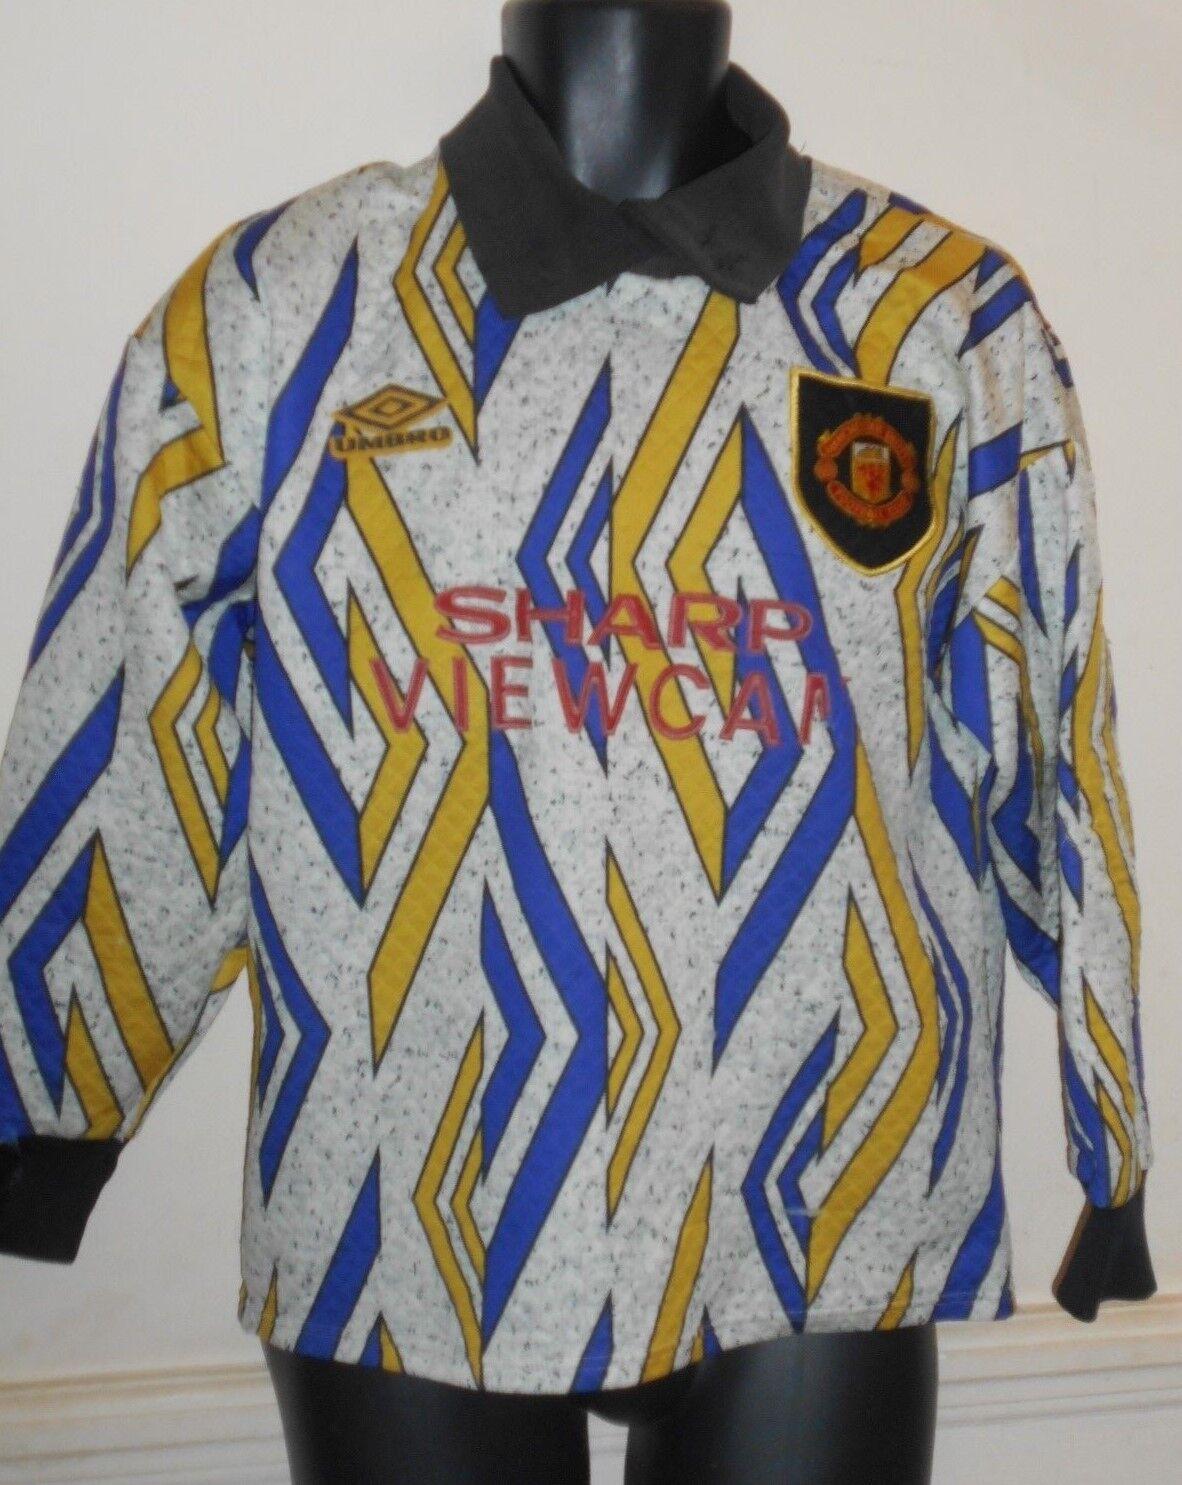 Raro Manchester United objetivo guardianes Camiseta de fútbol 1993-1994 pequeños para hombres  1032